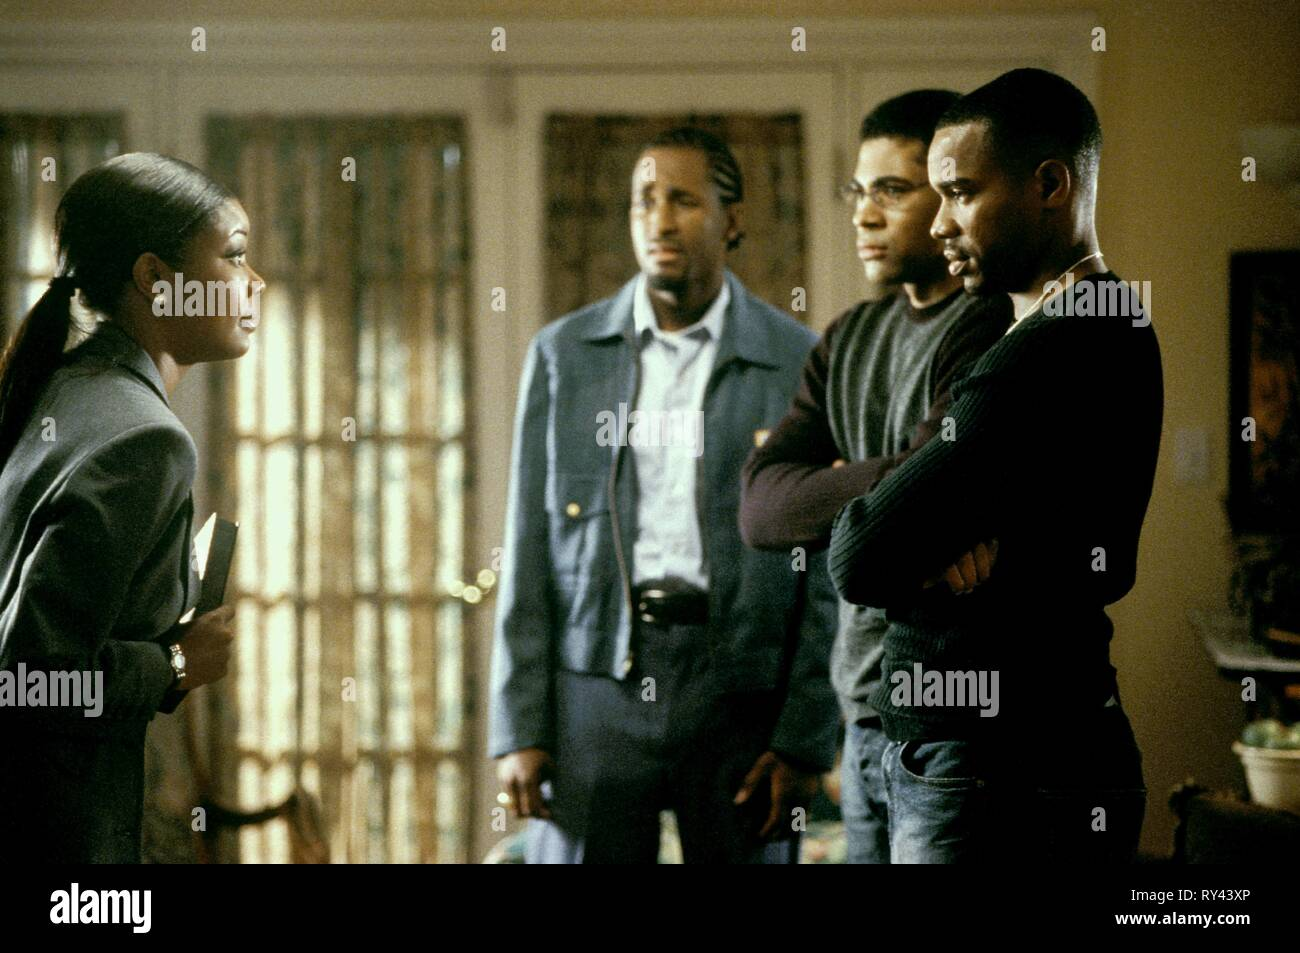 UNION,EDMONDS,JACKSON,MARTIN, DELIVER US FROM EVA, 2003 - Stock Image